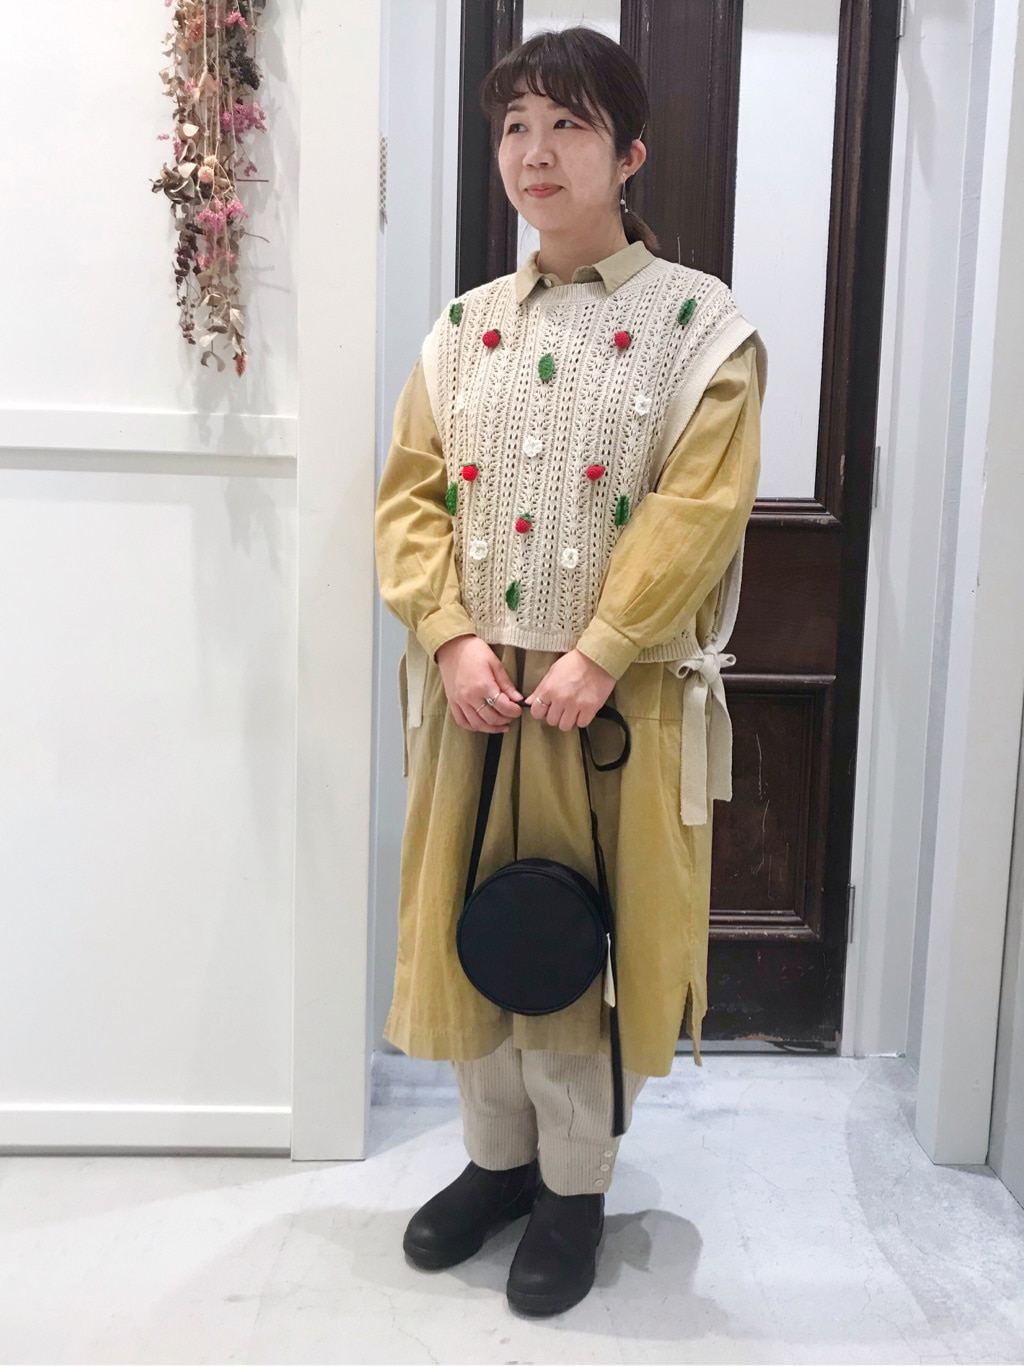 chambre de charme キラリナ京王吉祥寺 身長:155cm 2021.01.13